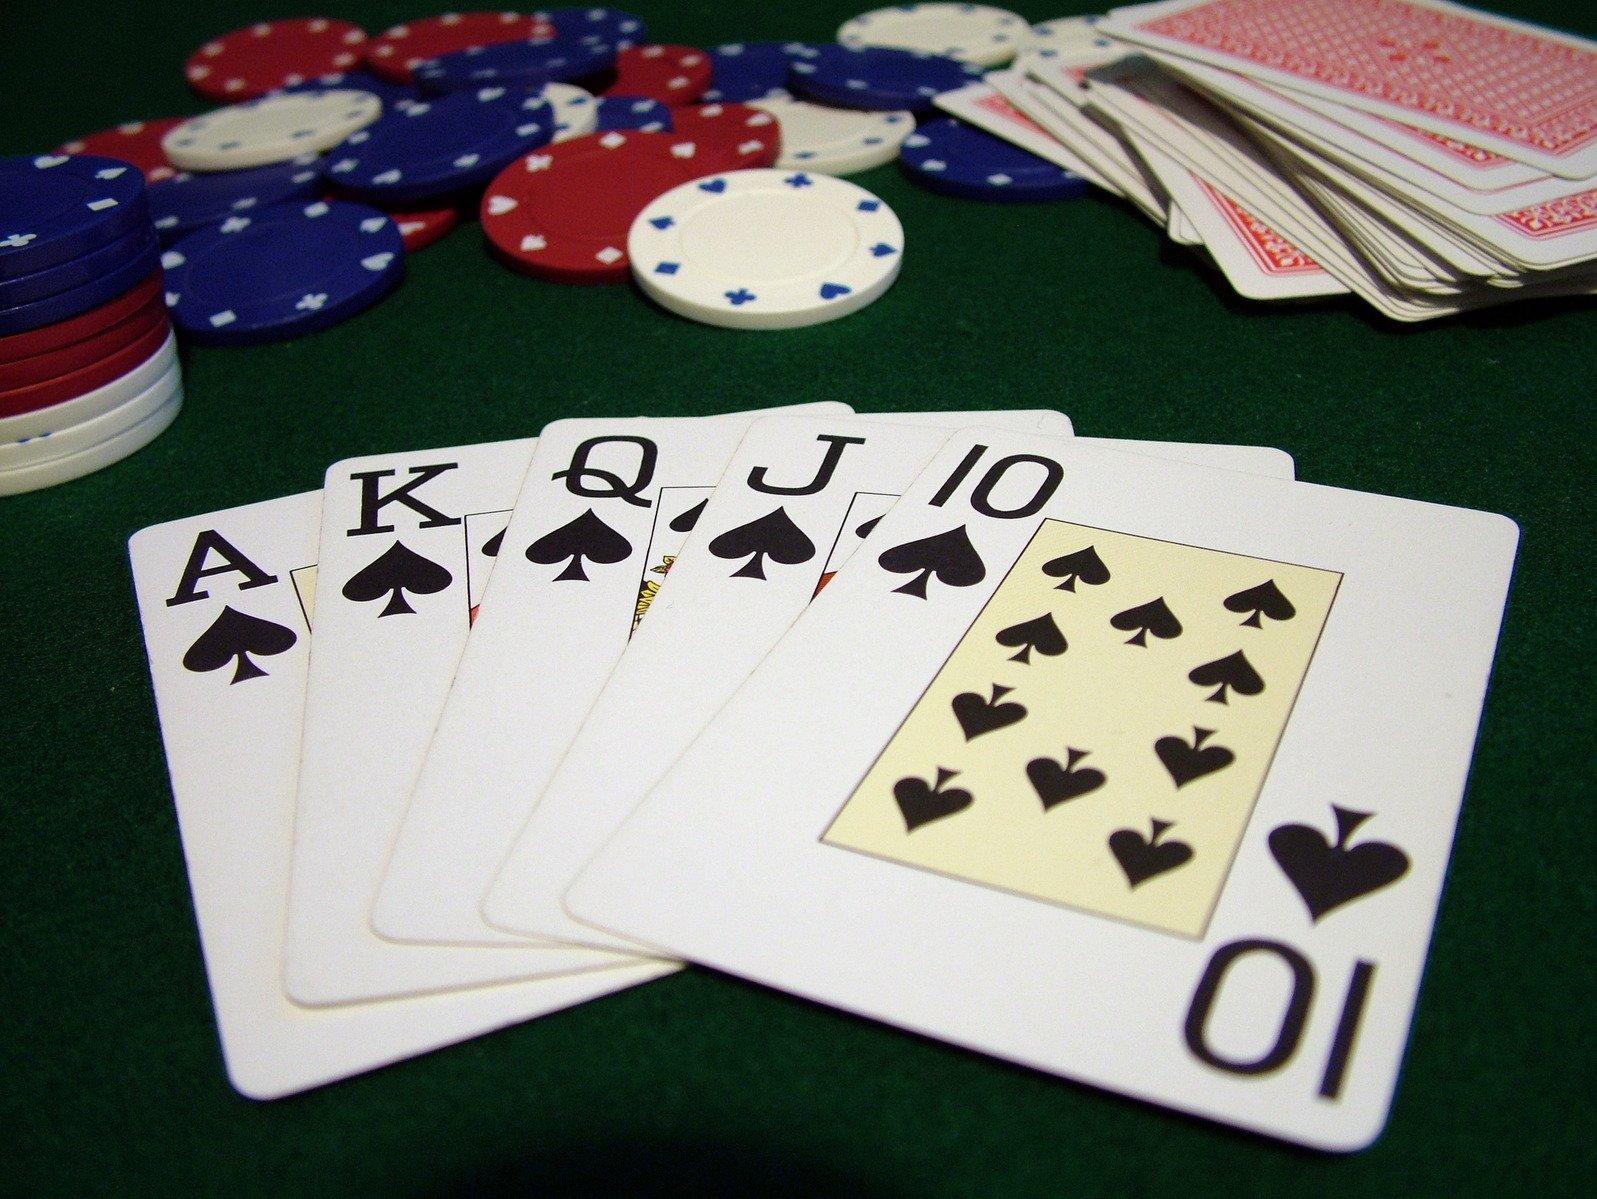 Saint John May Soon Have A Casino